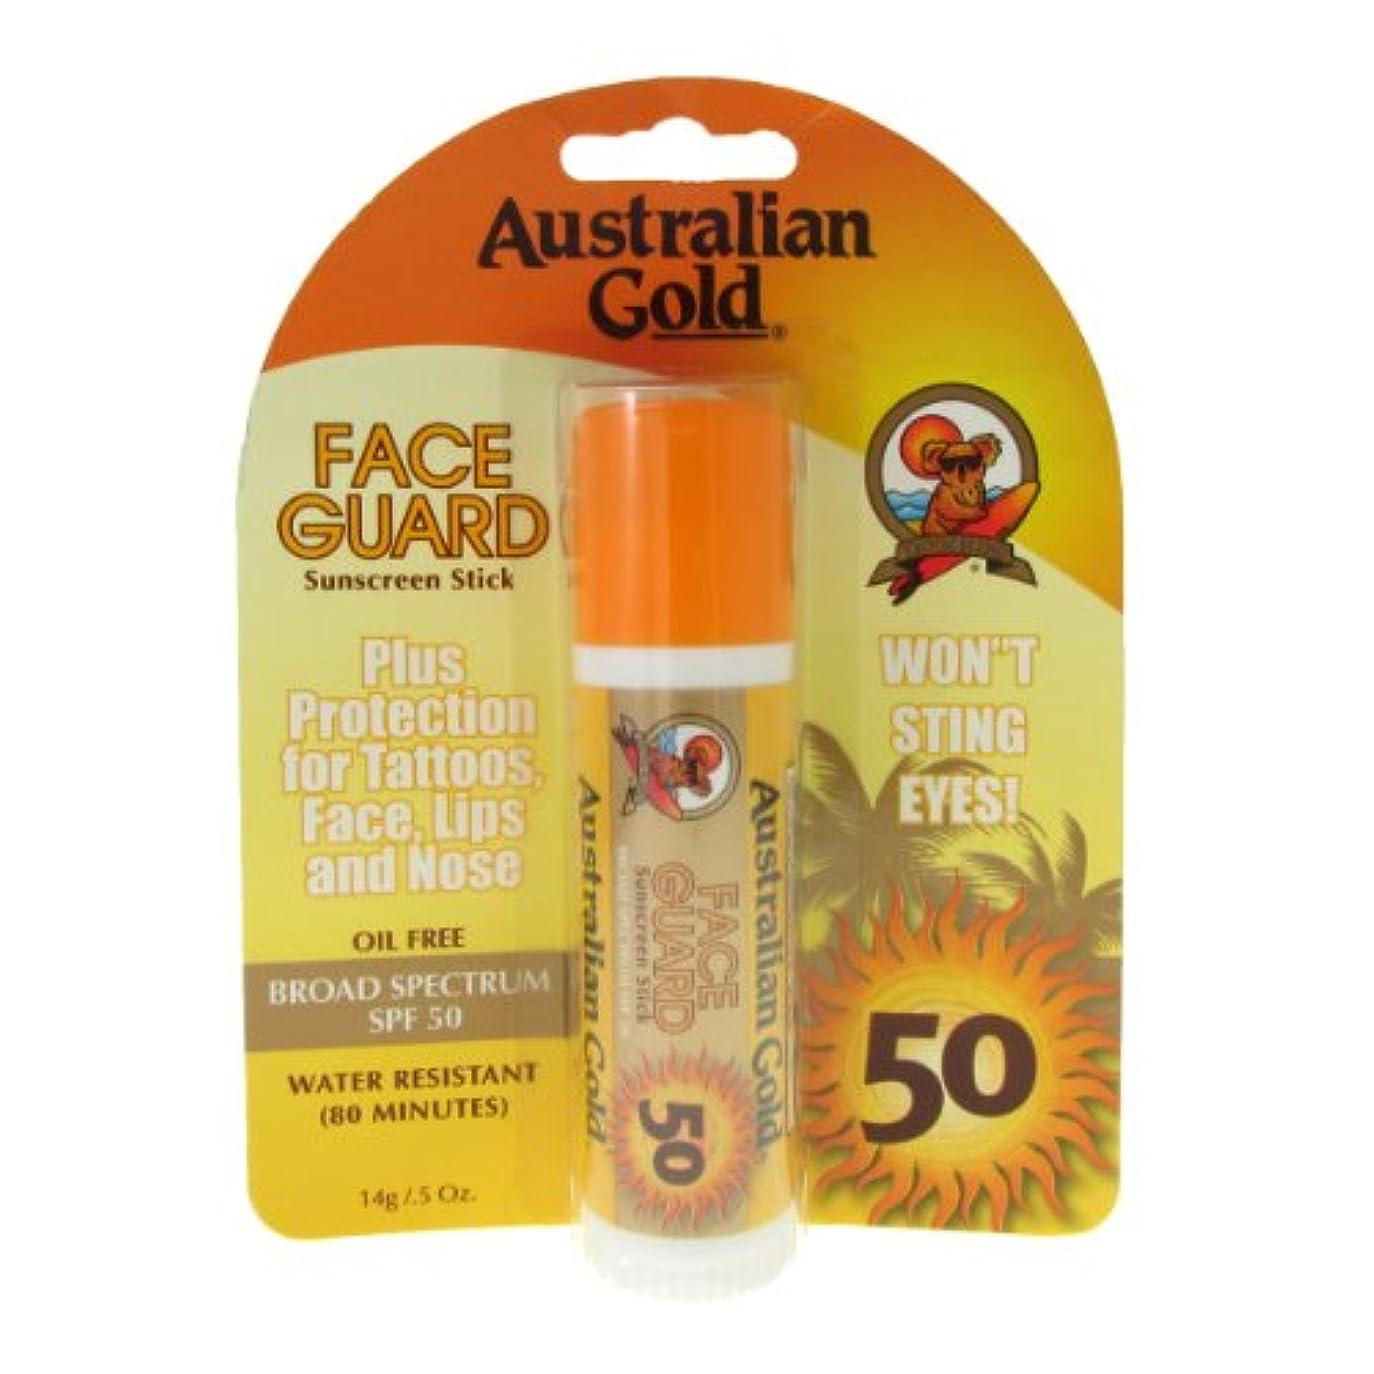 Australian Gold Face Guard Spf50 Stick 14gr [並行輸入品]